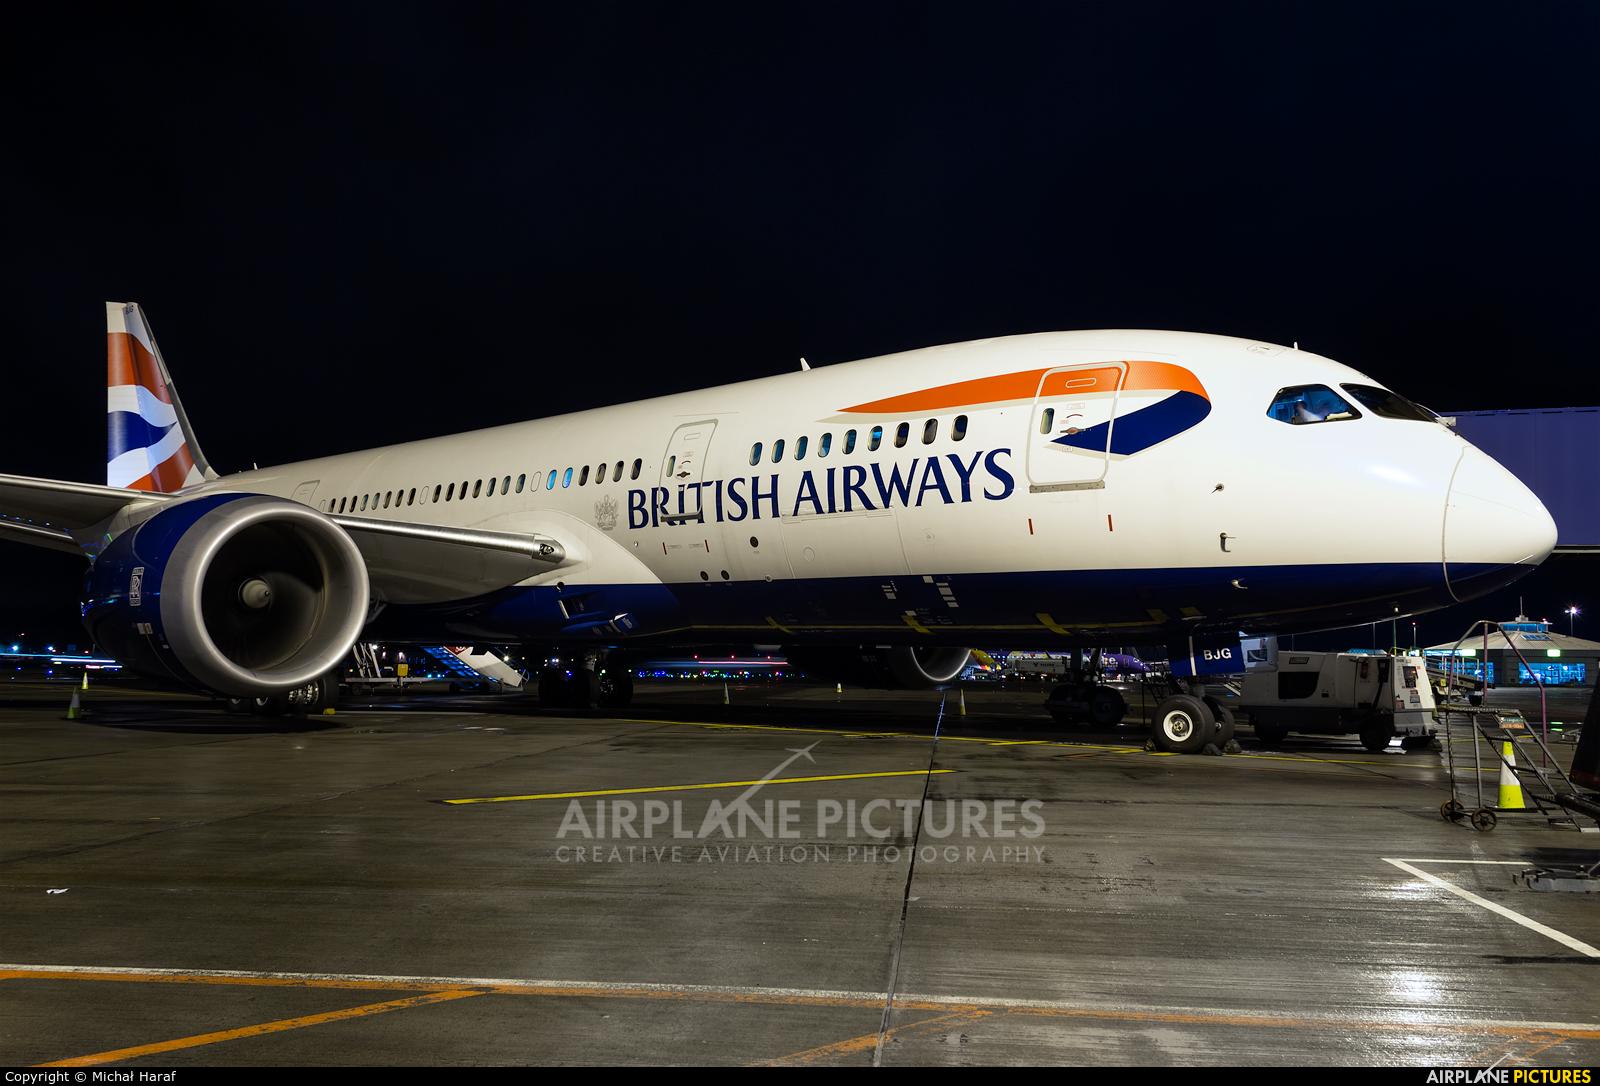 British Airways G-ZBJG aircraft at Dublin